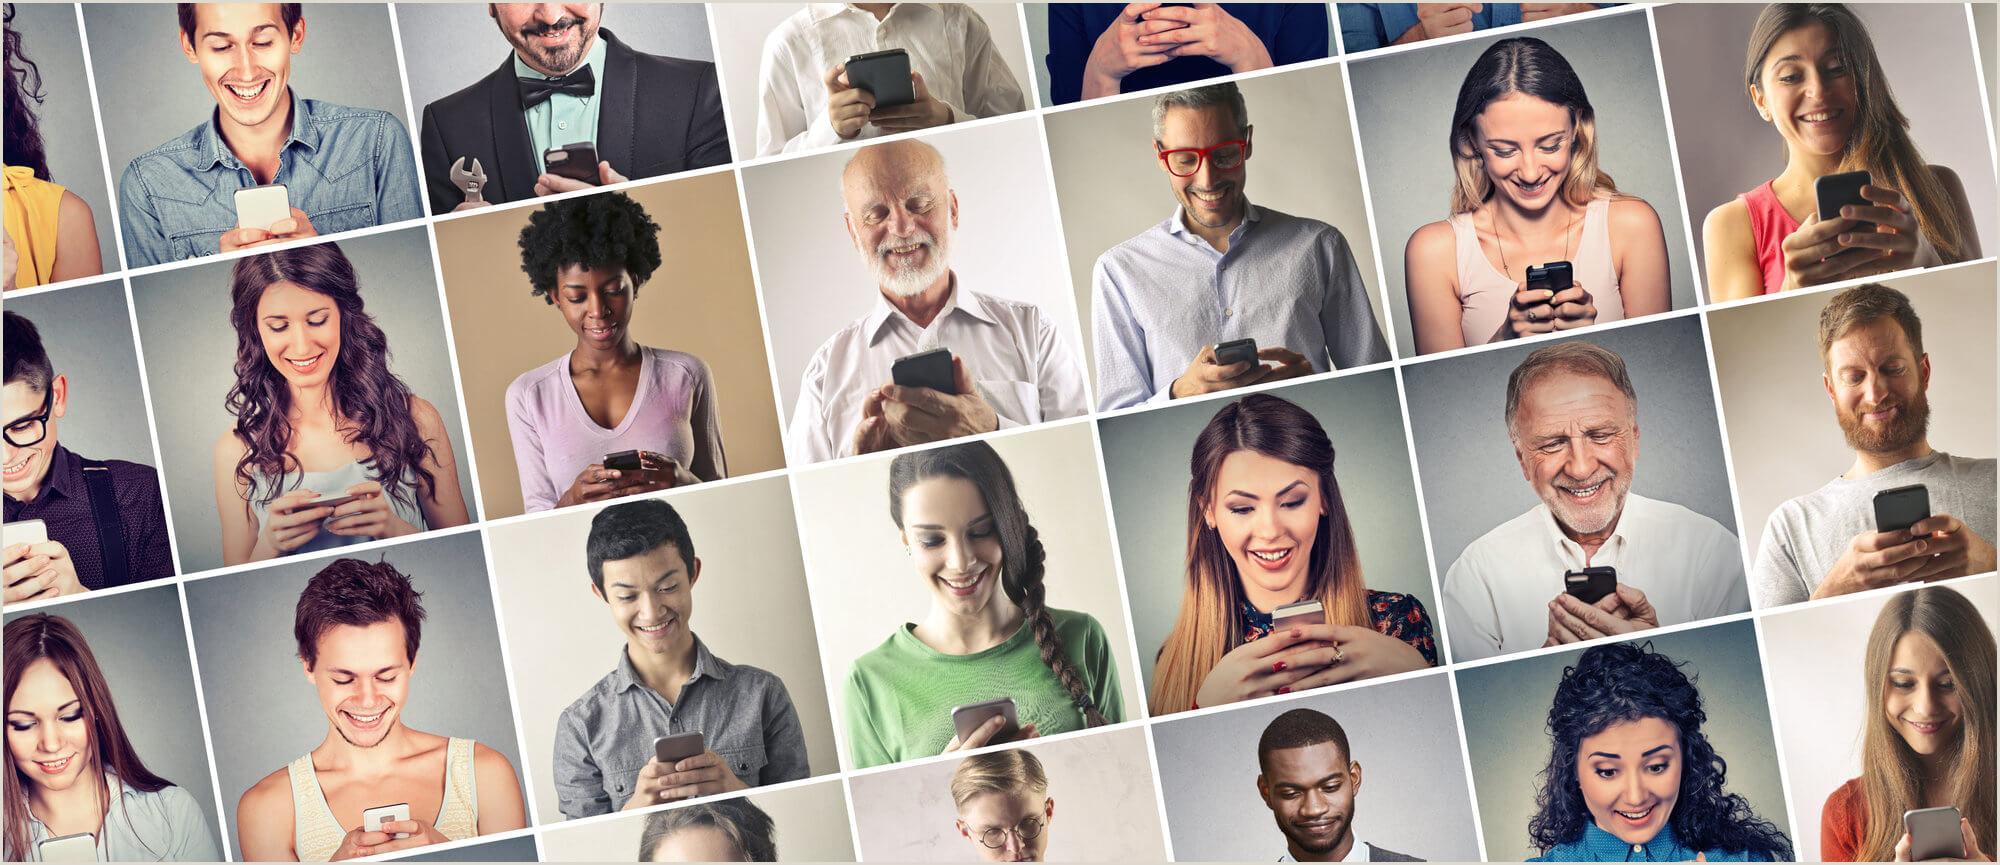 Biz Cards Online Dibiz Free Digital Business Cards